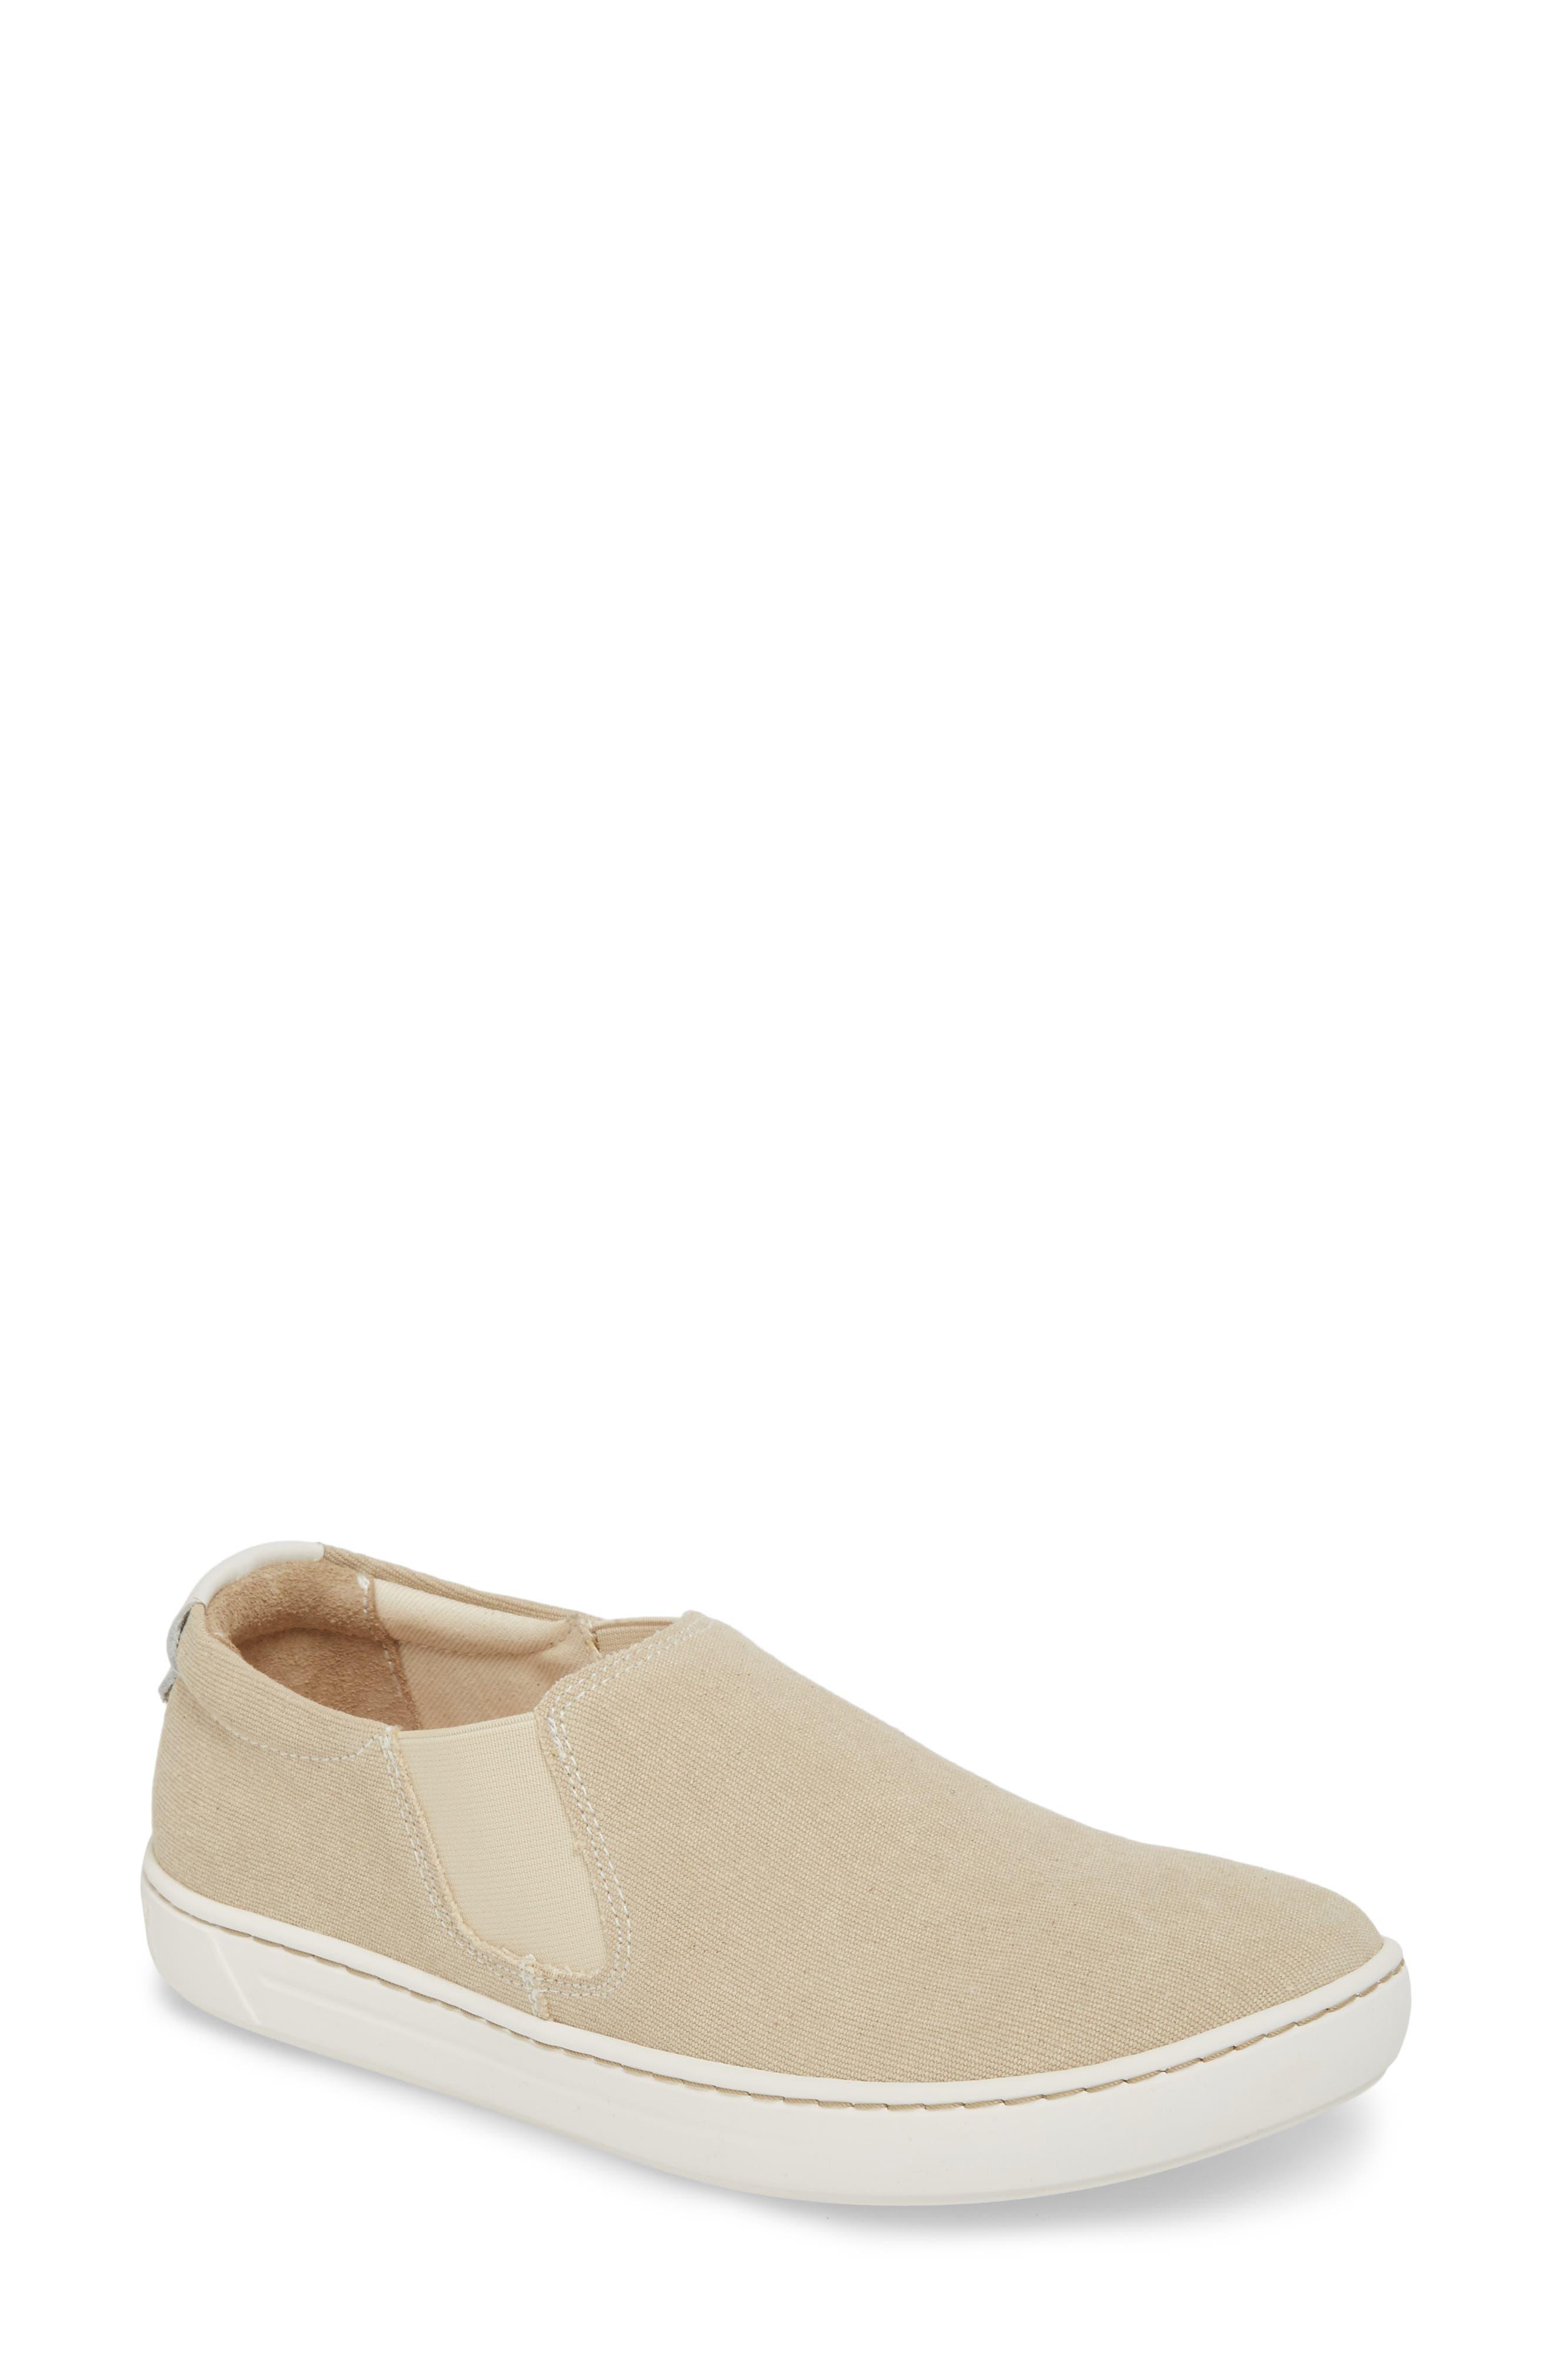 BIRKENSTOCK Barrie Slip-On Sneaker, Main, color, SAND CANVAS